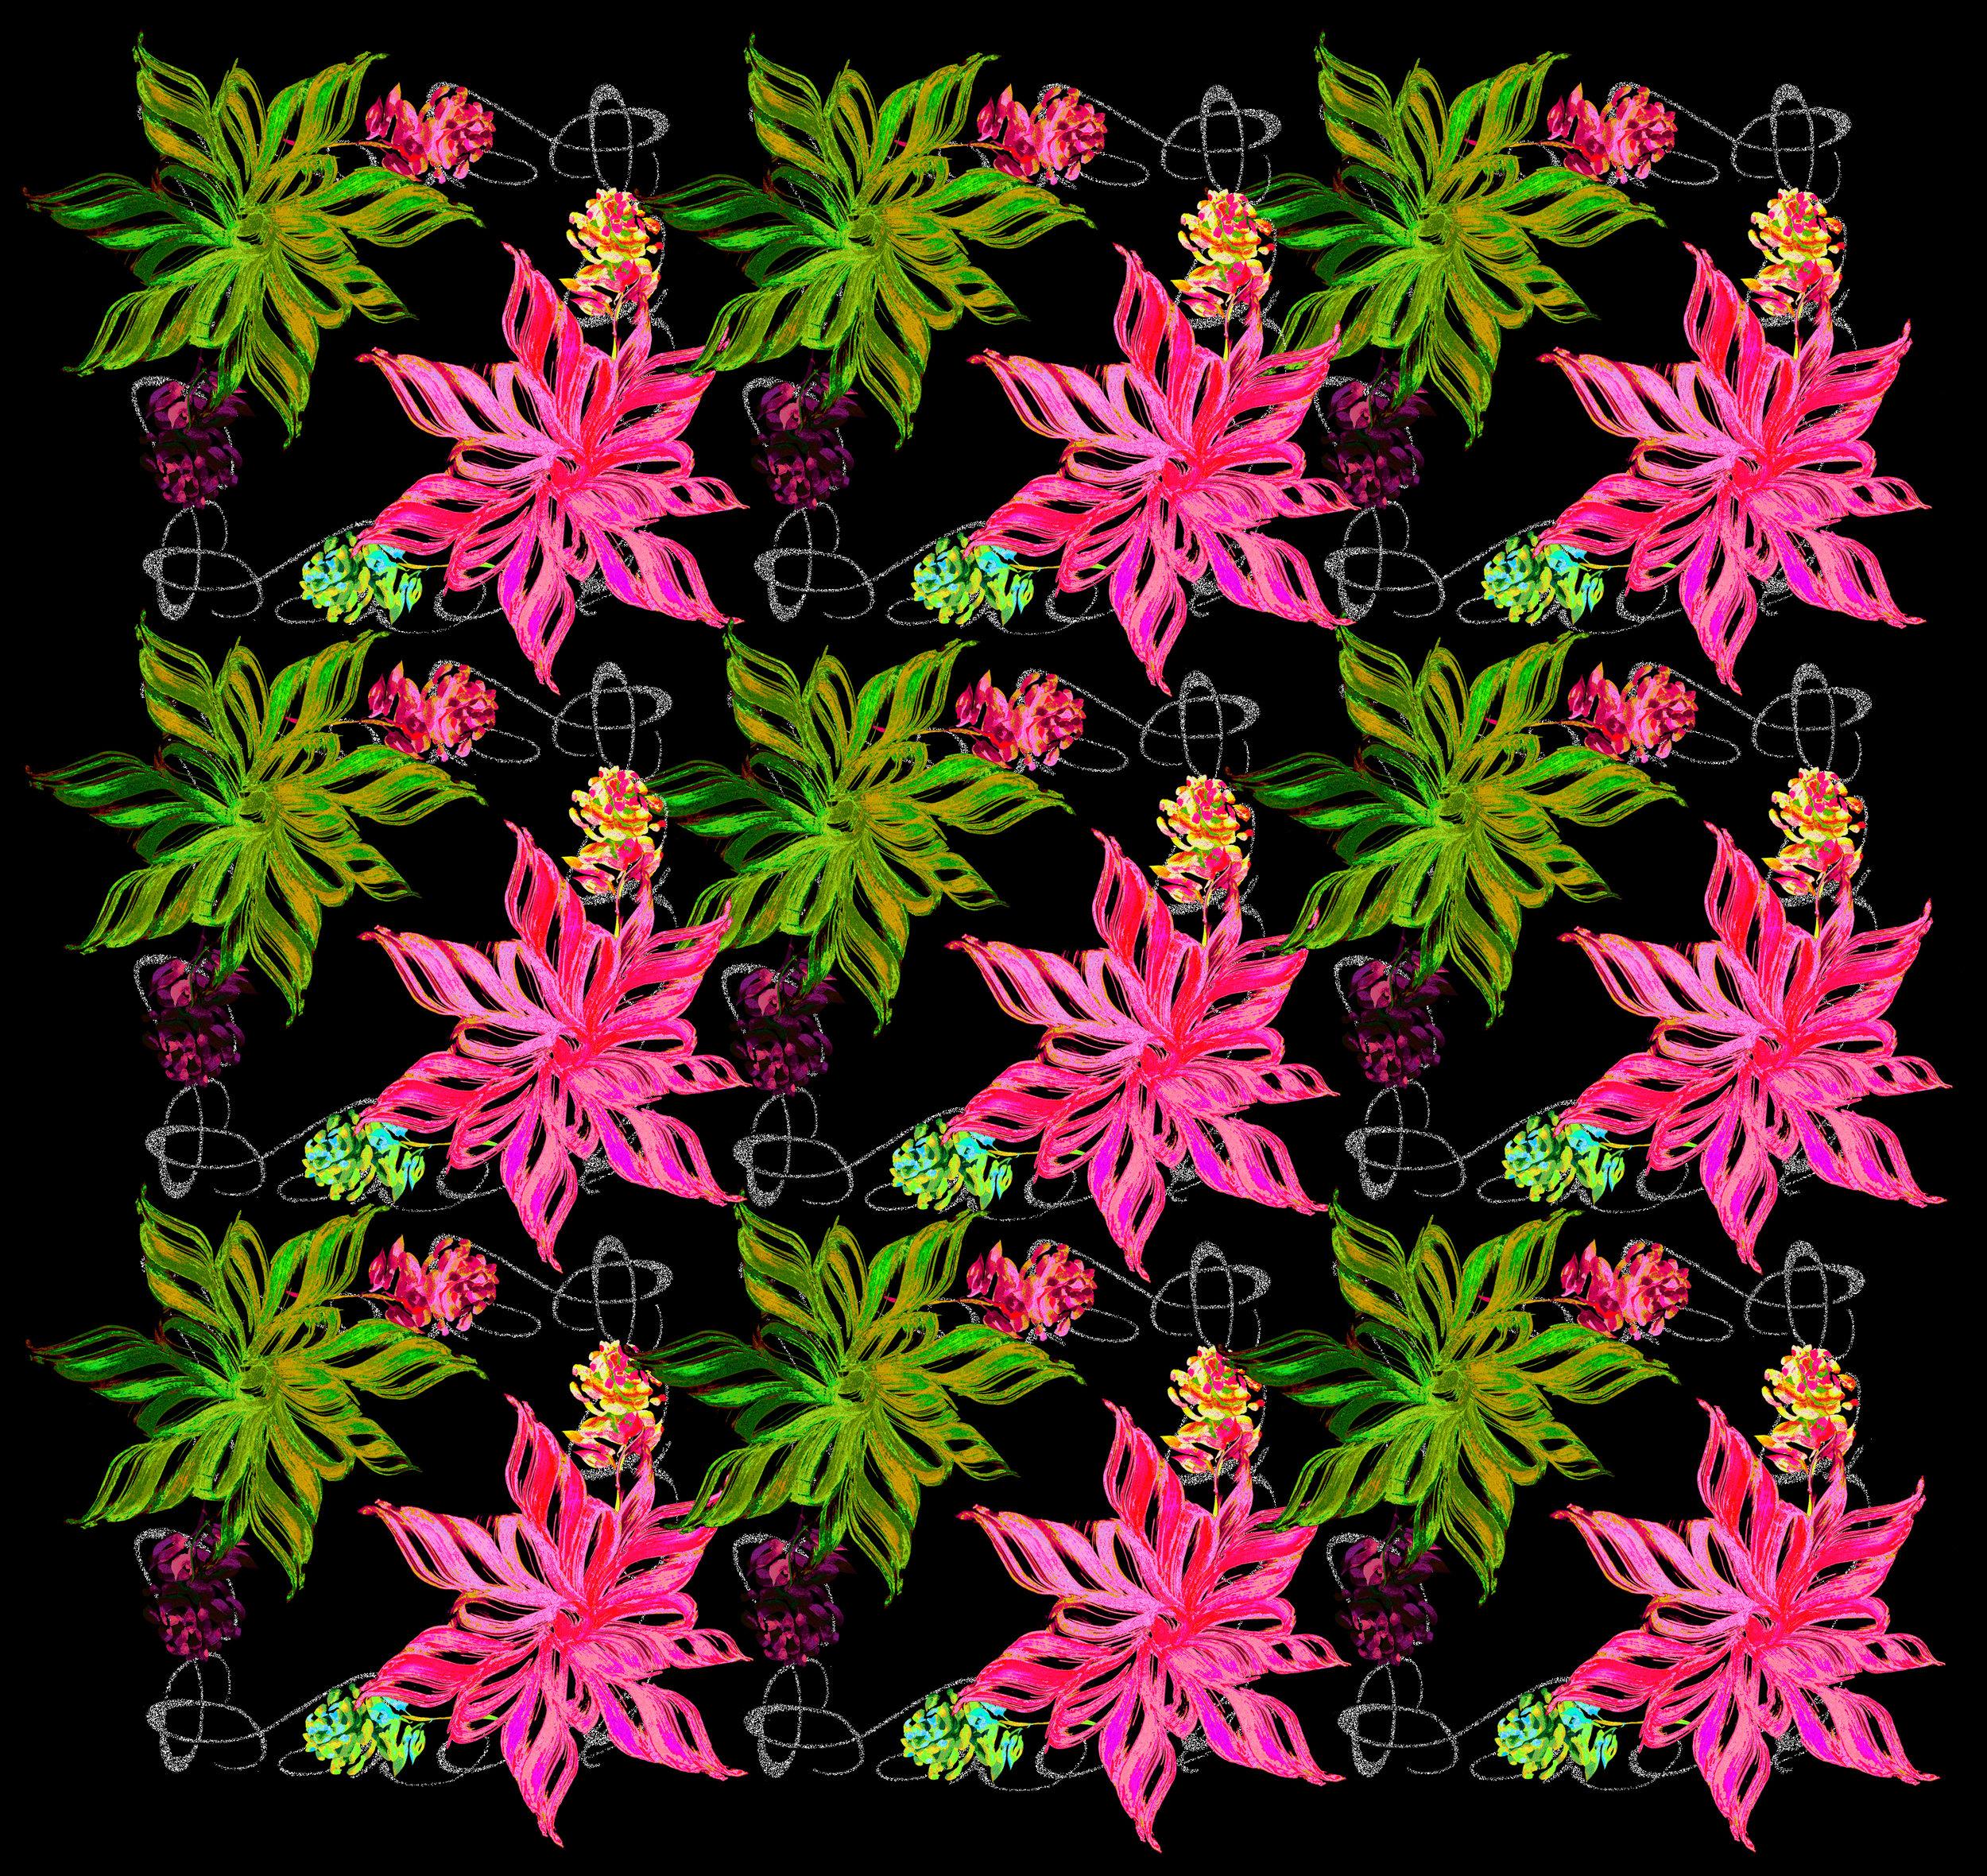 FLOWERSSTAR2.jpg